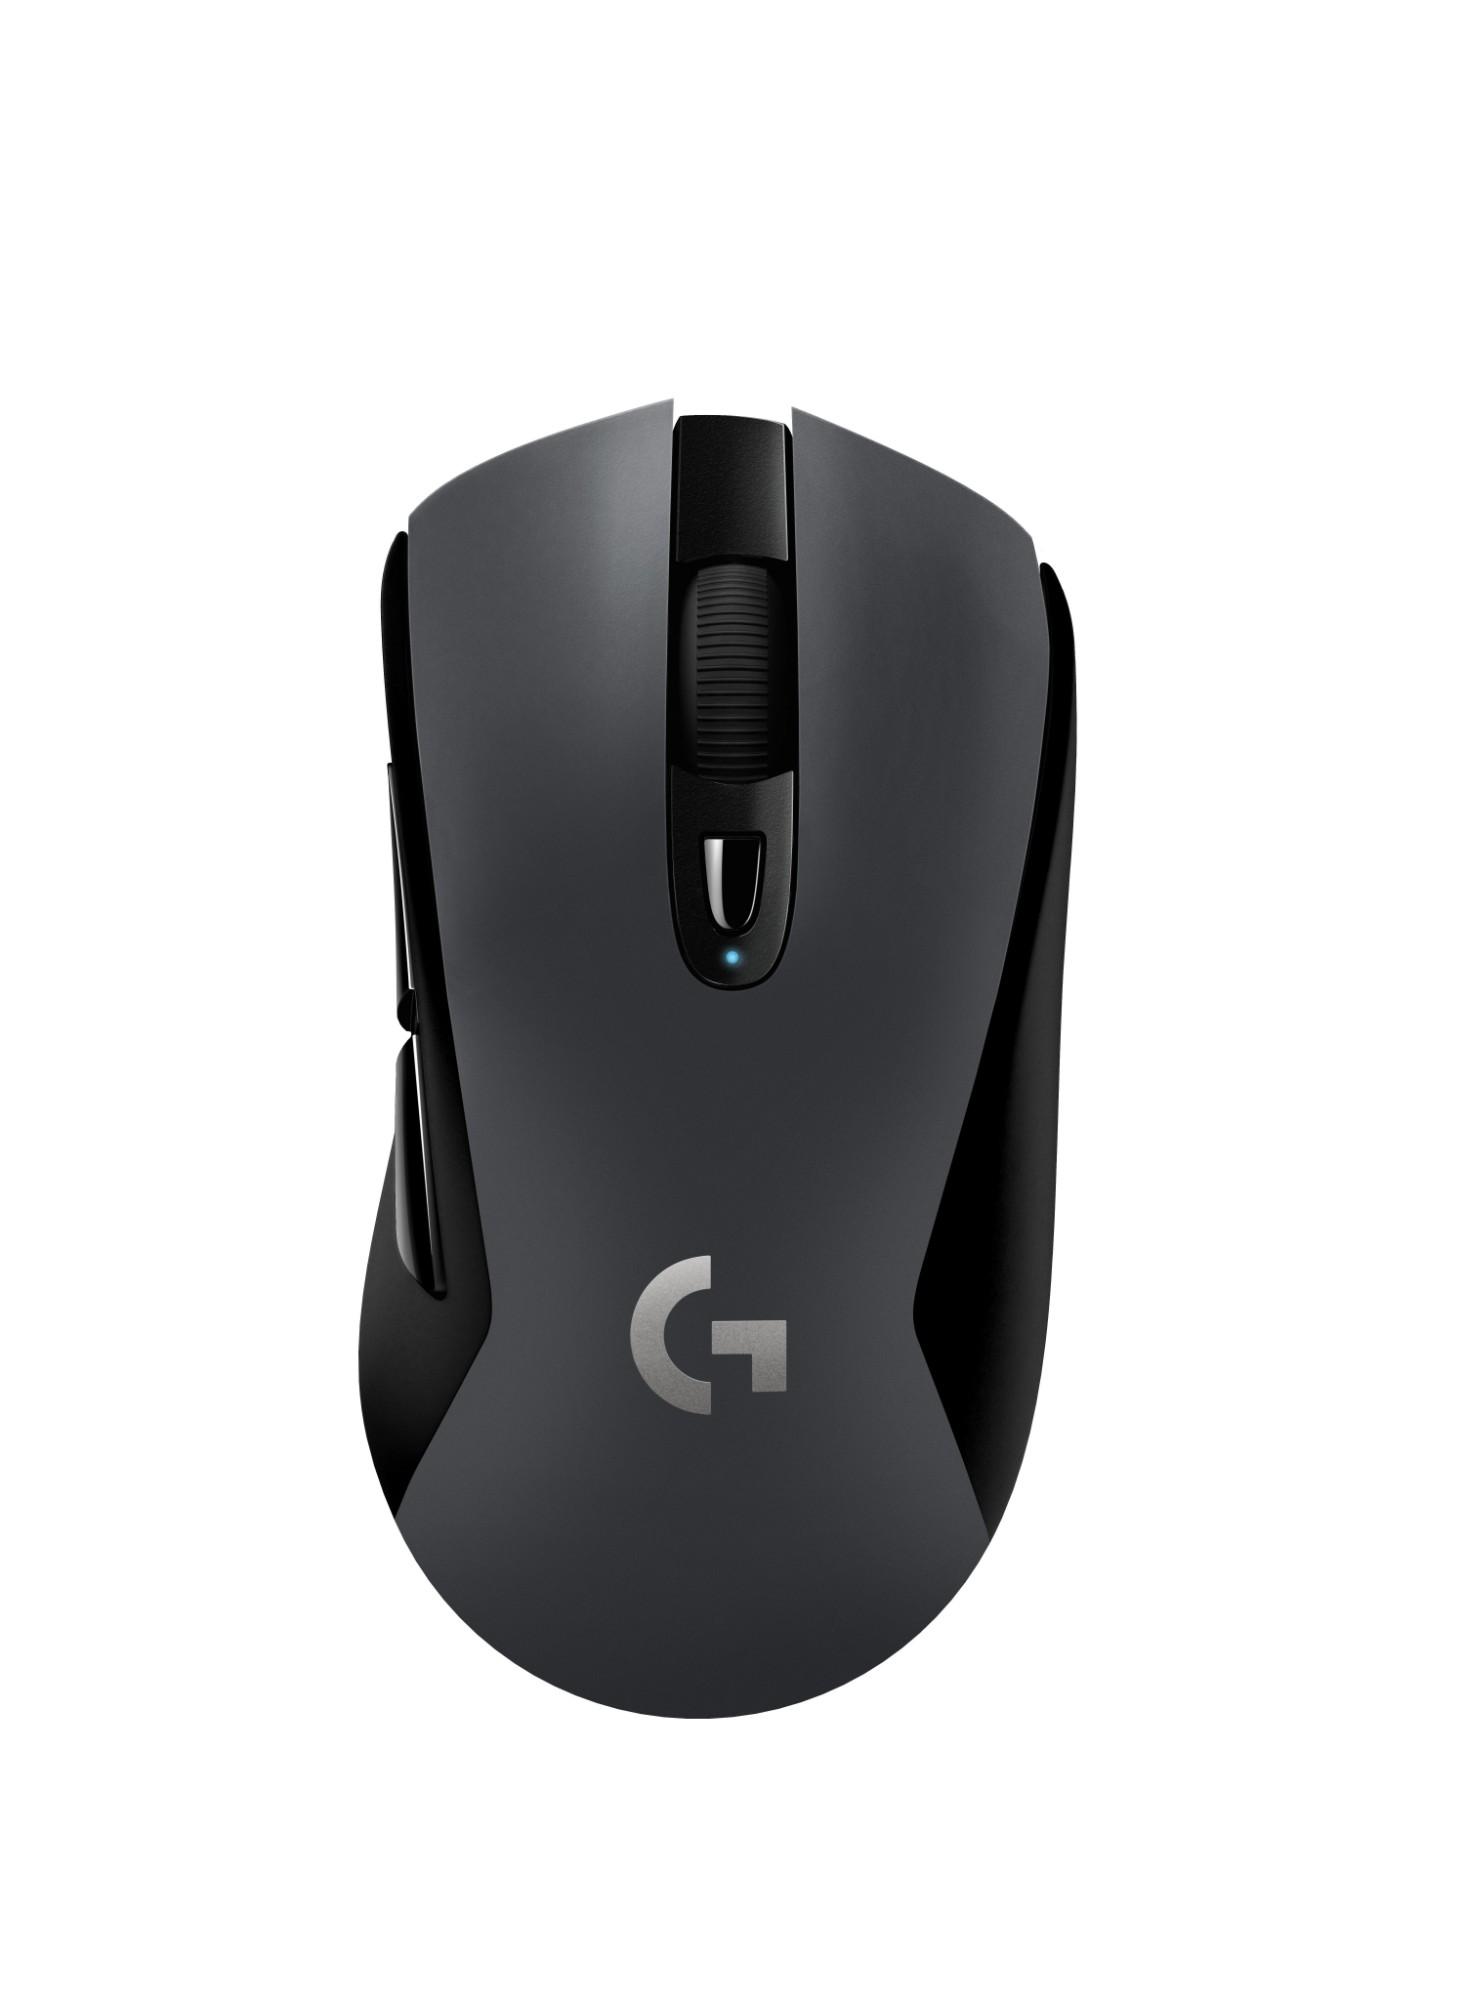 Logitech G G603 ratón RF inalámbrica + Bluetooth Óptico 12000 DPI mano derecha